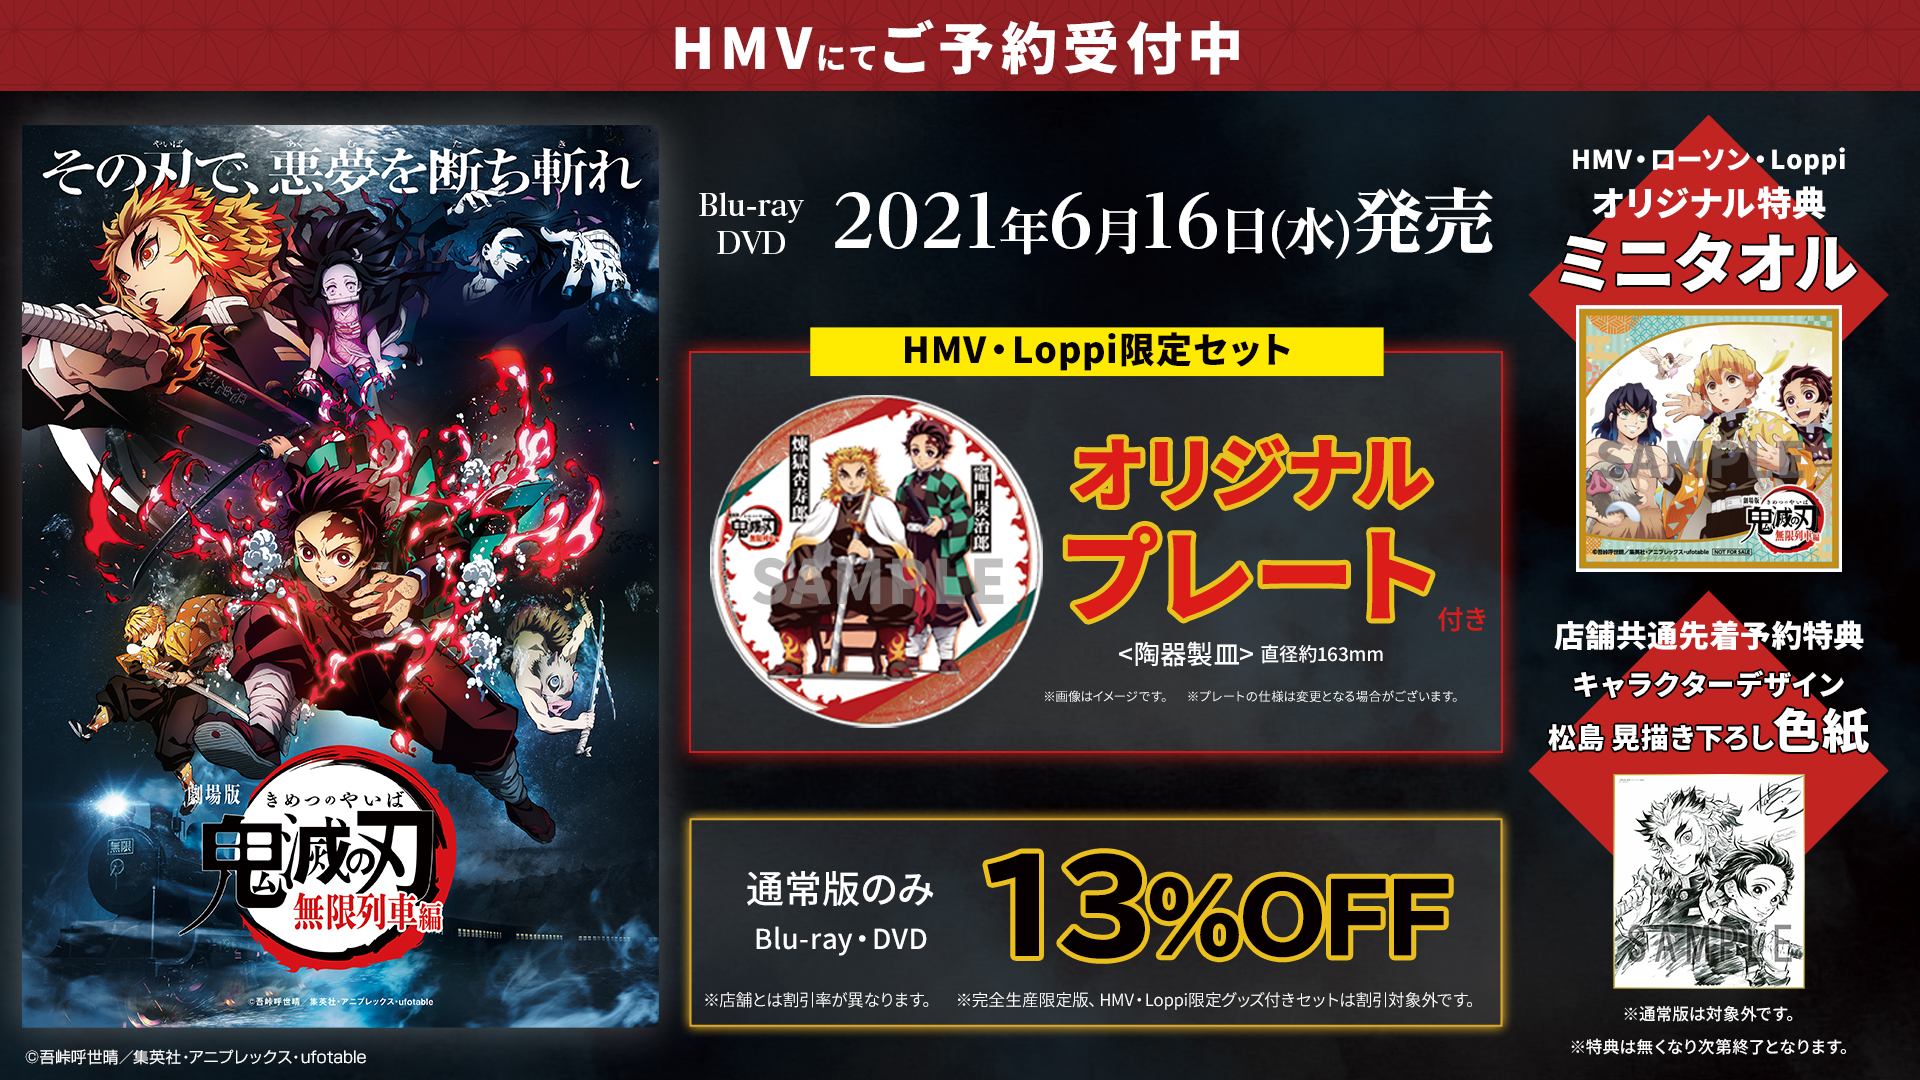 https://img.hmv.co.jp/hybridimage/news/images/21/0402/1006/body_151622.jpeg